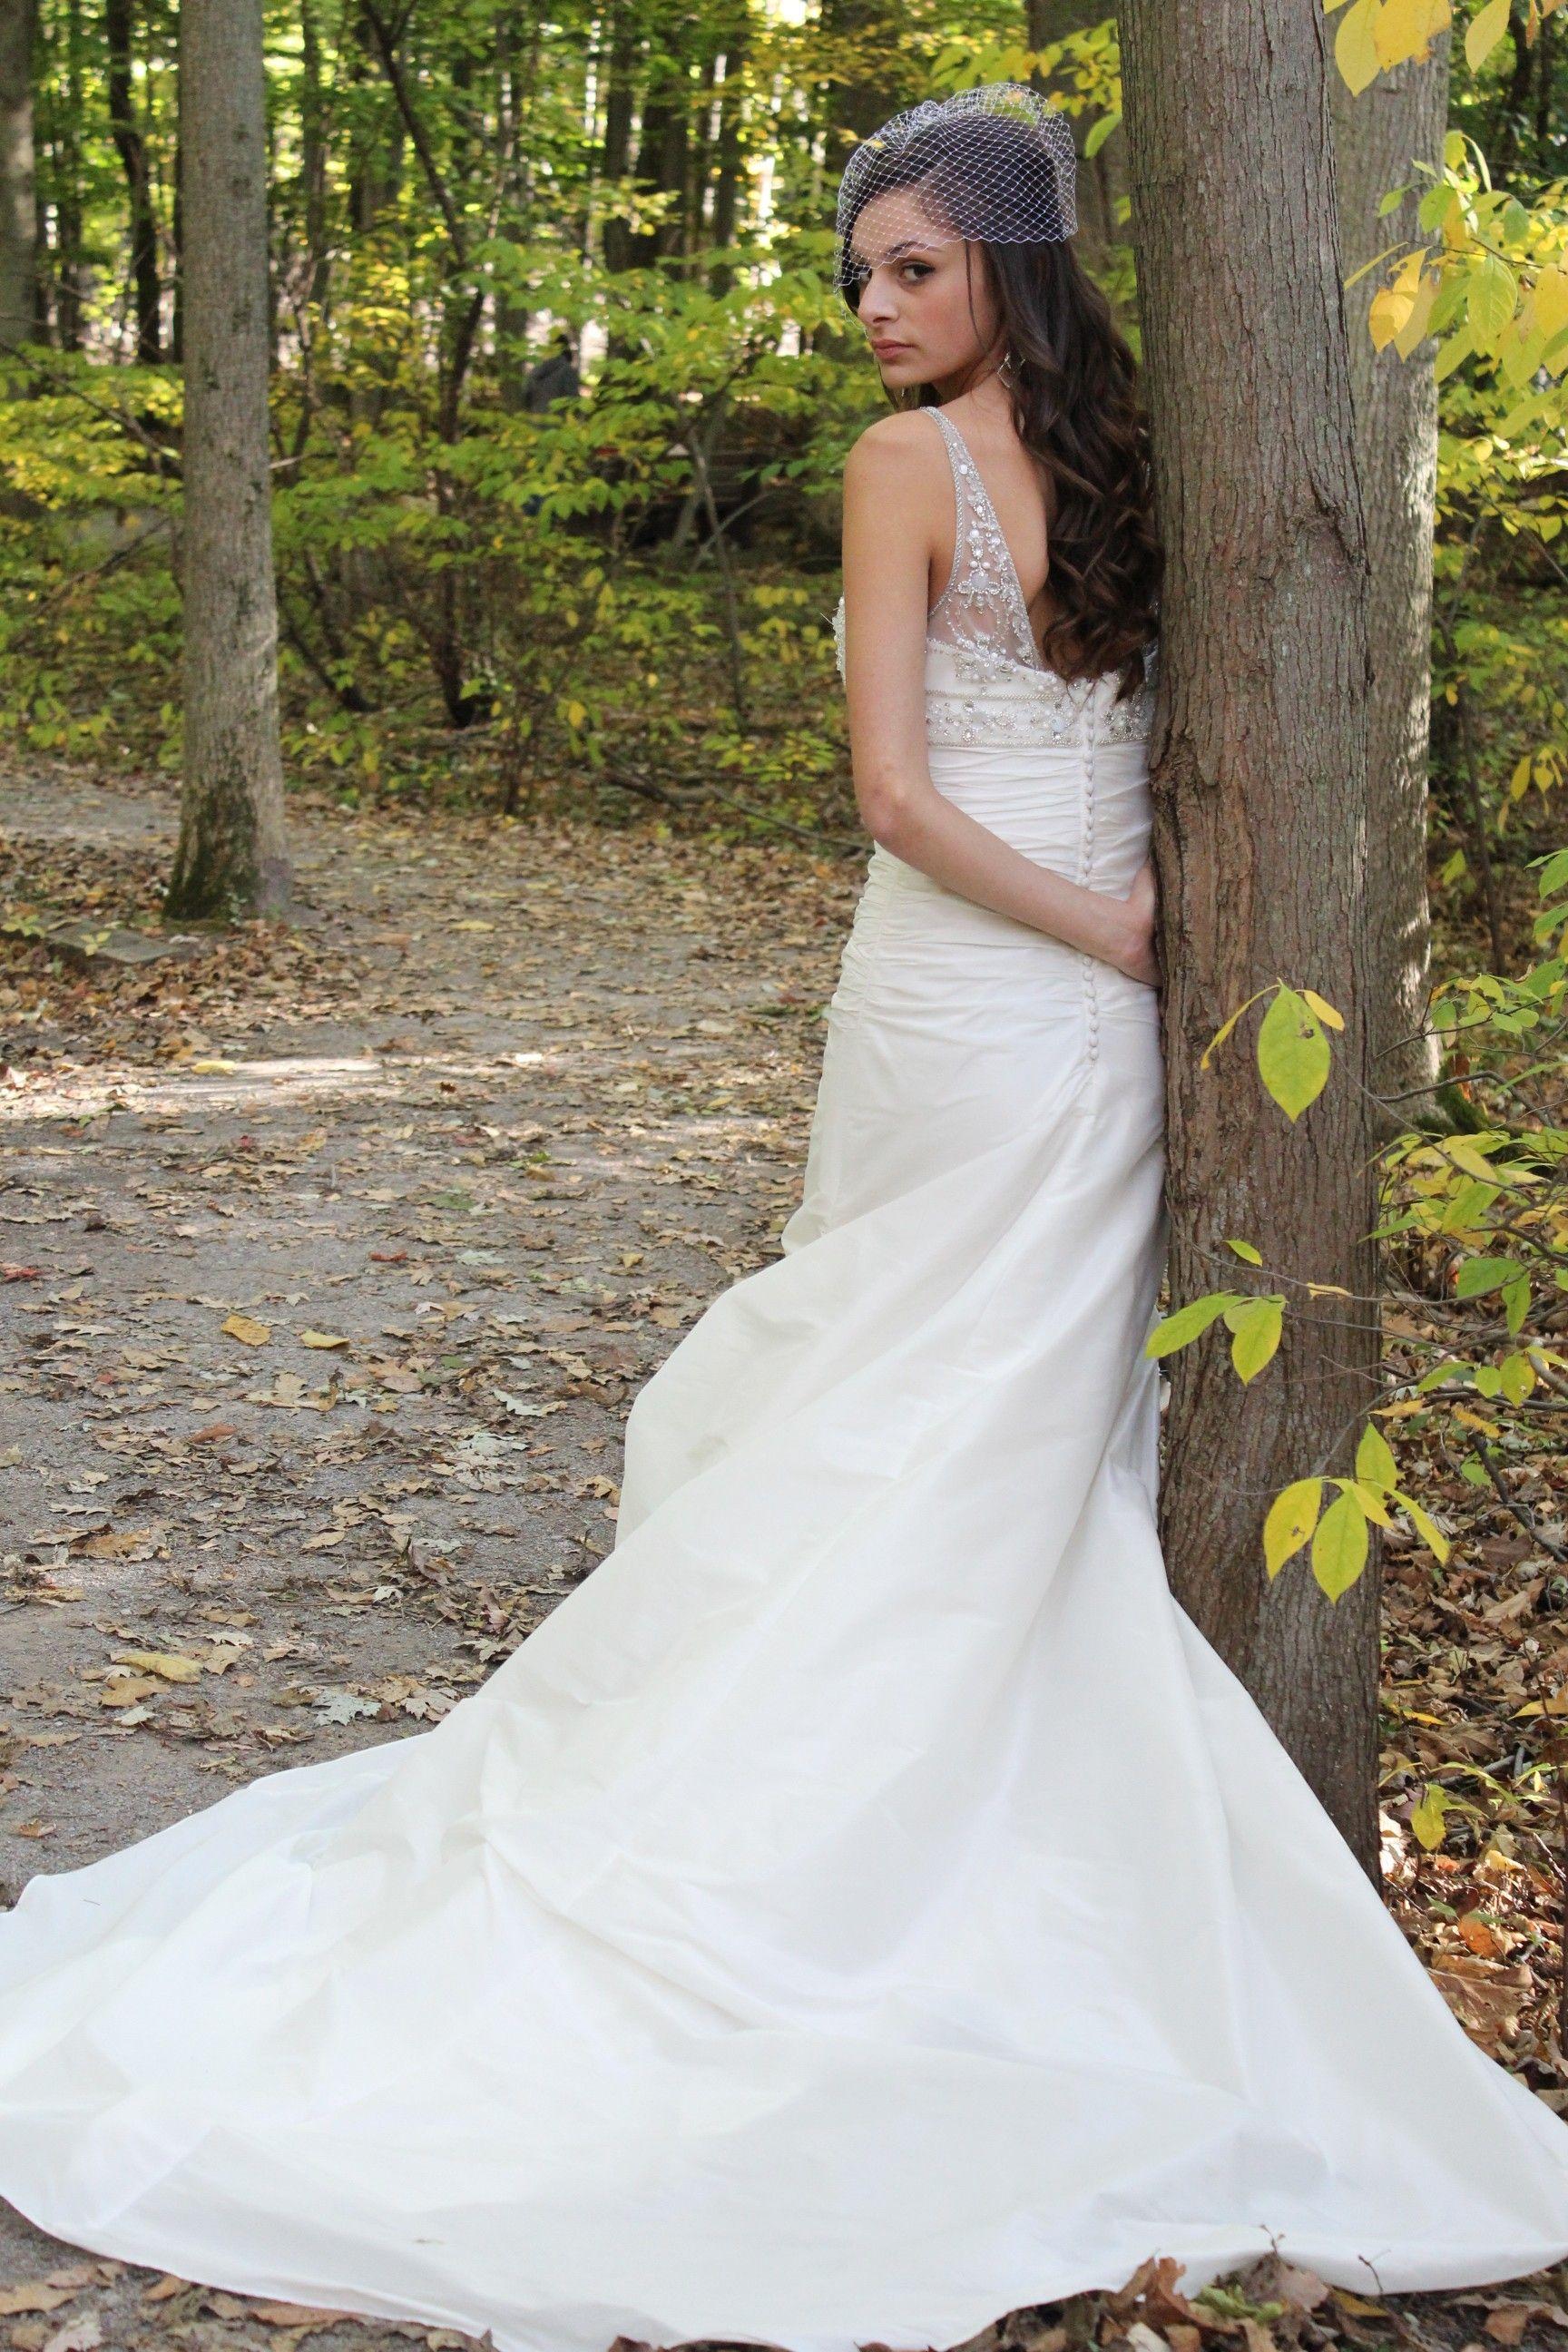 Mermaid style shantung wedding gown for sale on ebay